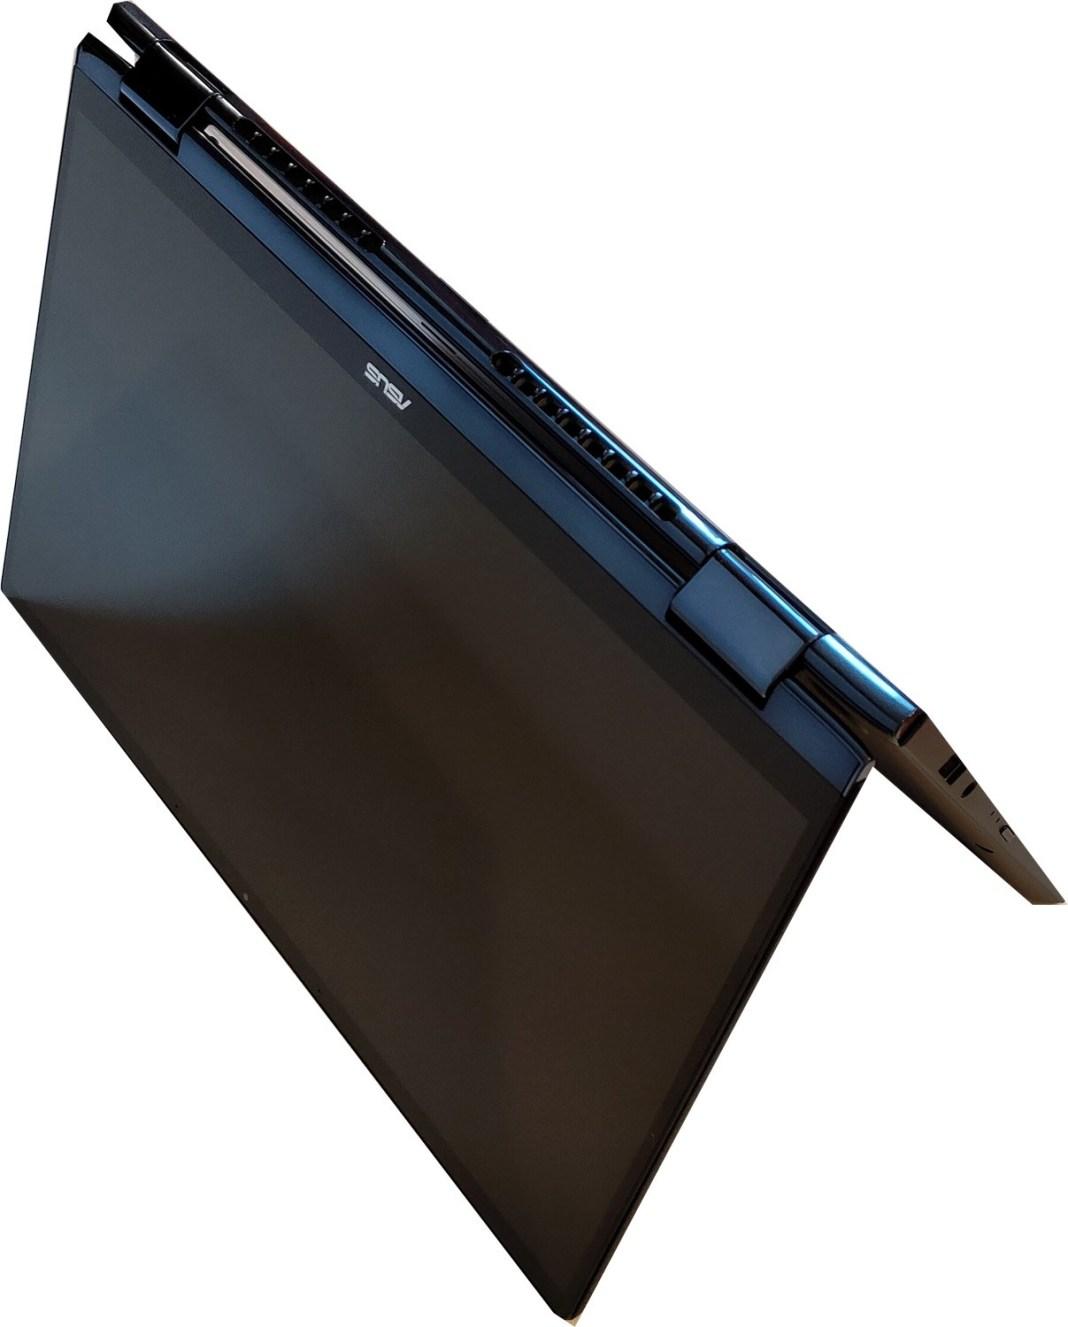 Ревю на ASUS ZenBook Flip 13 UX362F: ултрабук-трансформър от ново поколение